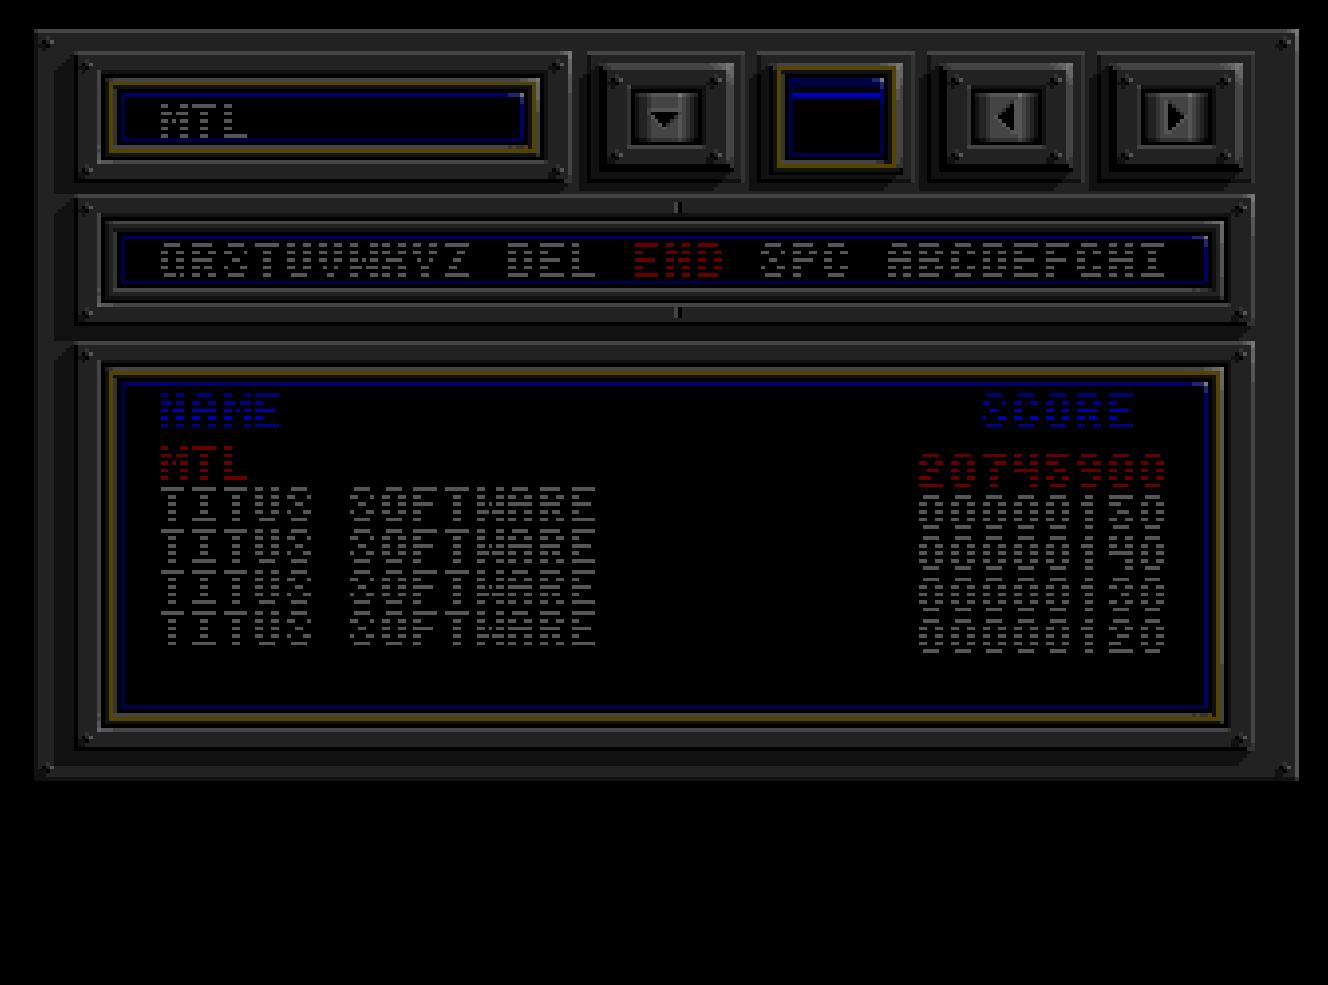 Mantalow: Galactic Conqueror (Amiga Emulated) 20,745,900 points on 2016-07-21 05:55:08